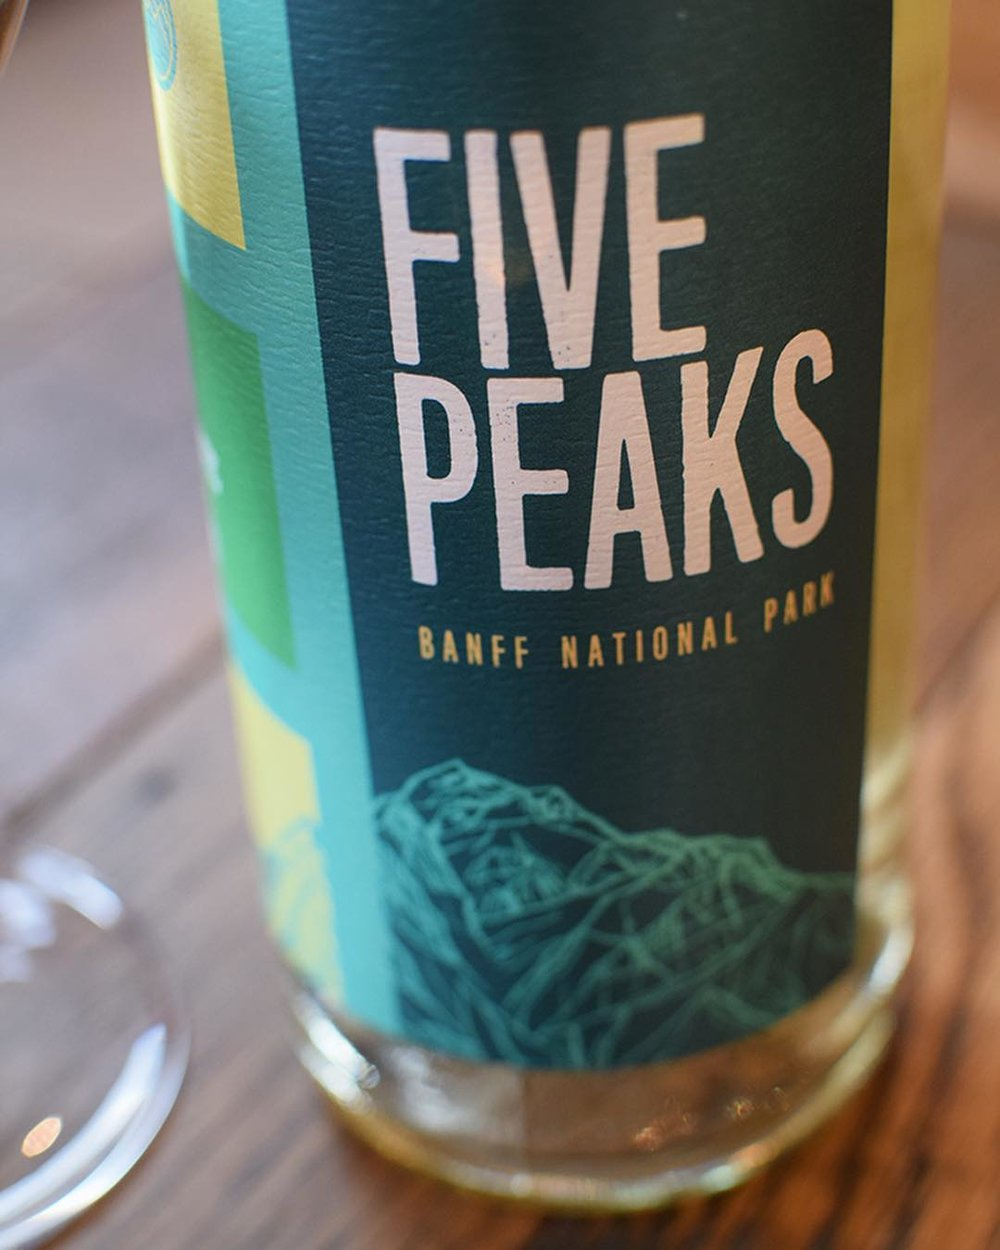 5 peaks